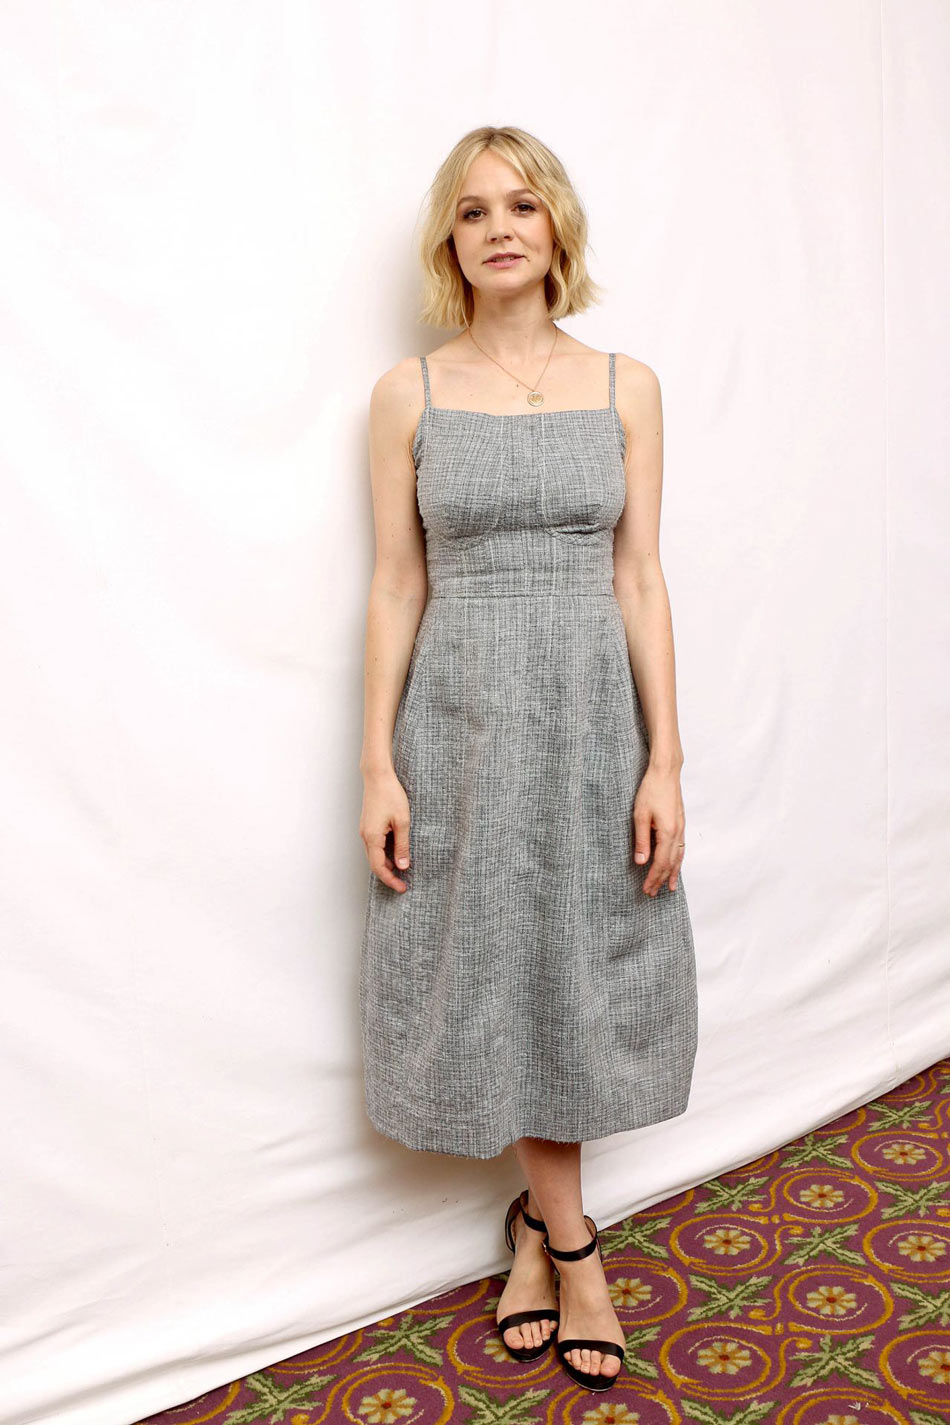 Carey Mulligan Mudbound Photocall at TIFF in Fur & Claw Closed Circle Fur Pendant in Rose Gold look